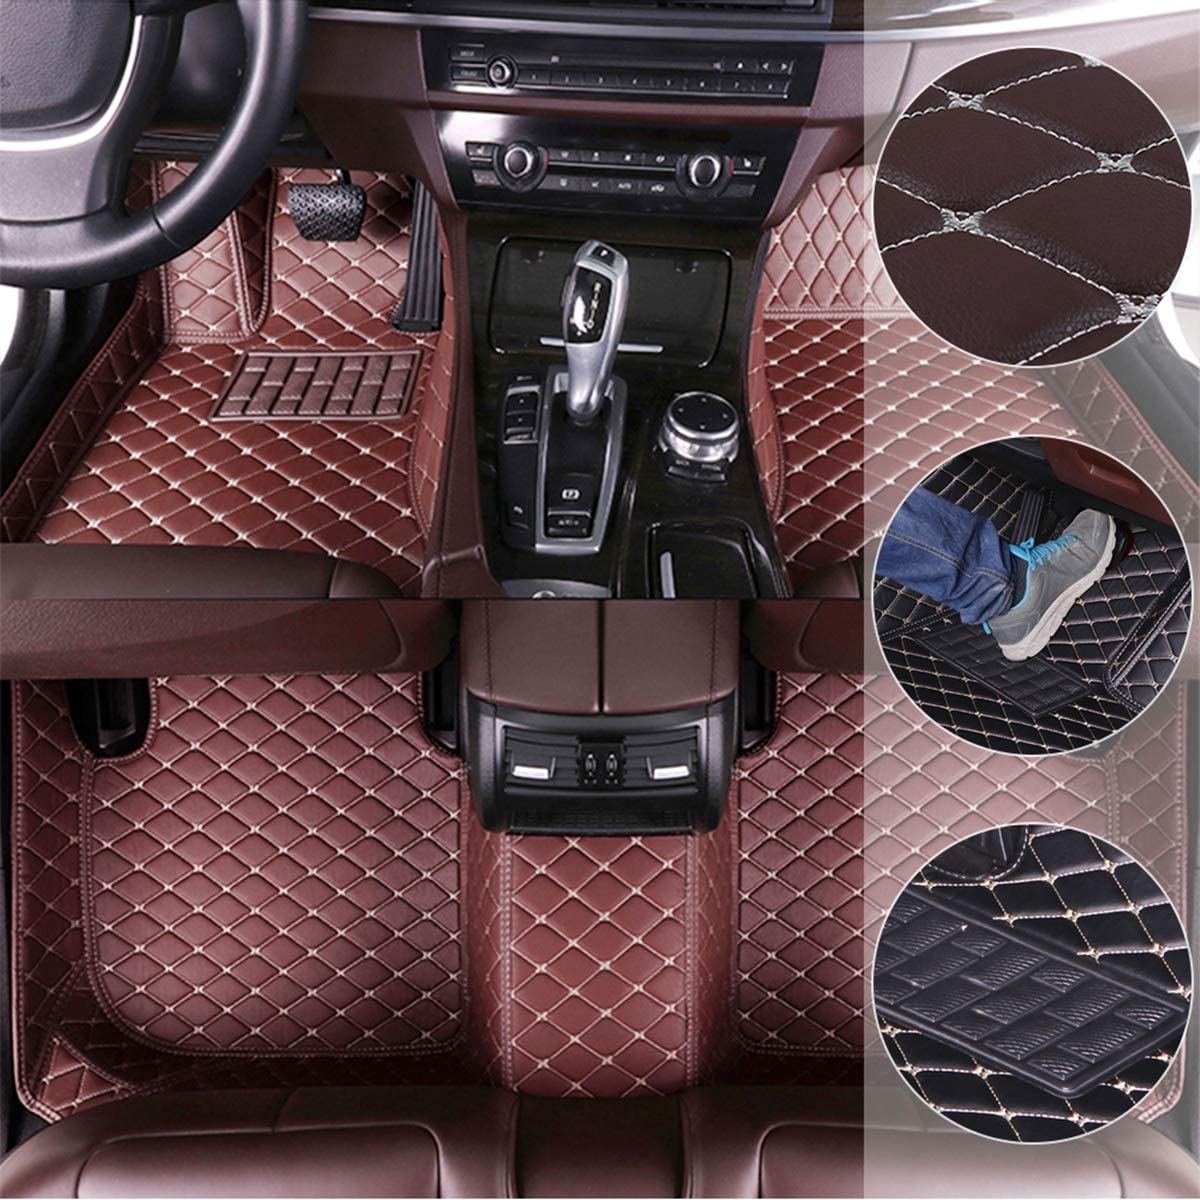 Custom Car Floor Mats for Dodge RAM 1500 2011-2017 Waterproof Non-Slip Leather Liners Automotive Carpets Interior Accessories Full Set Black